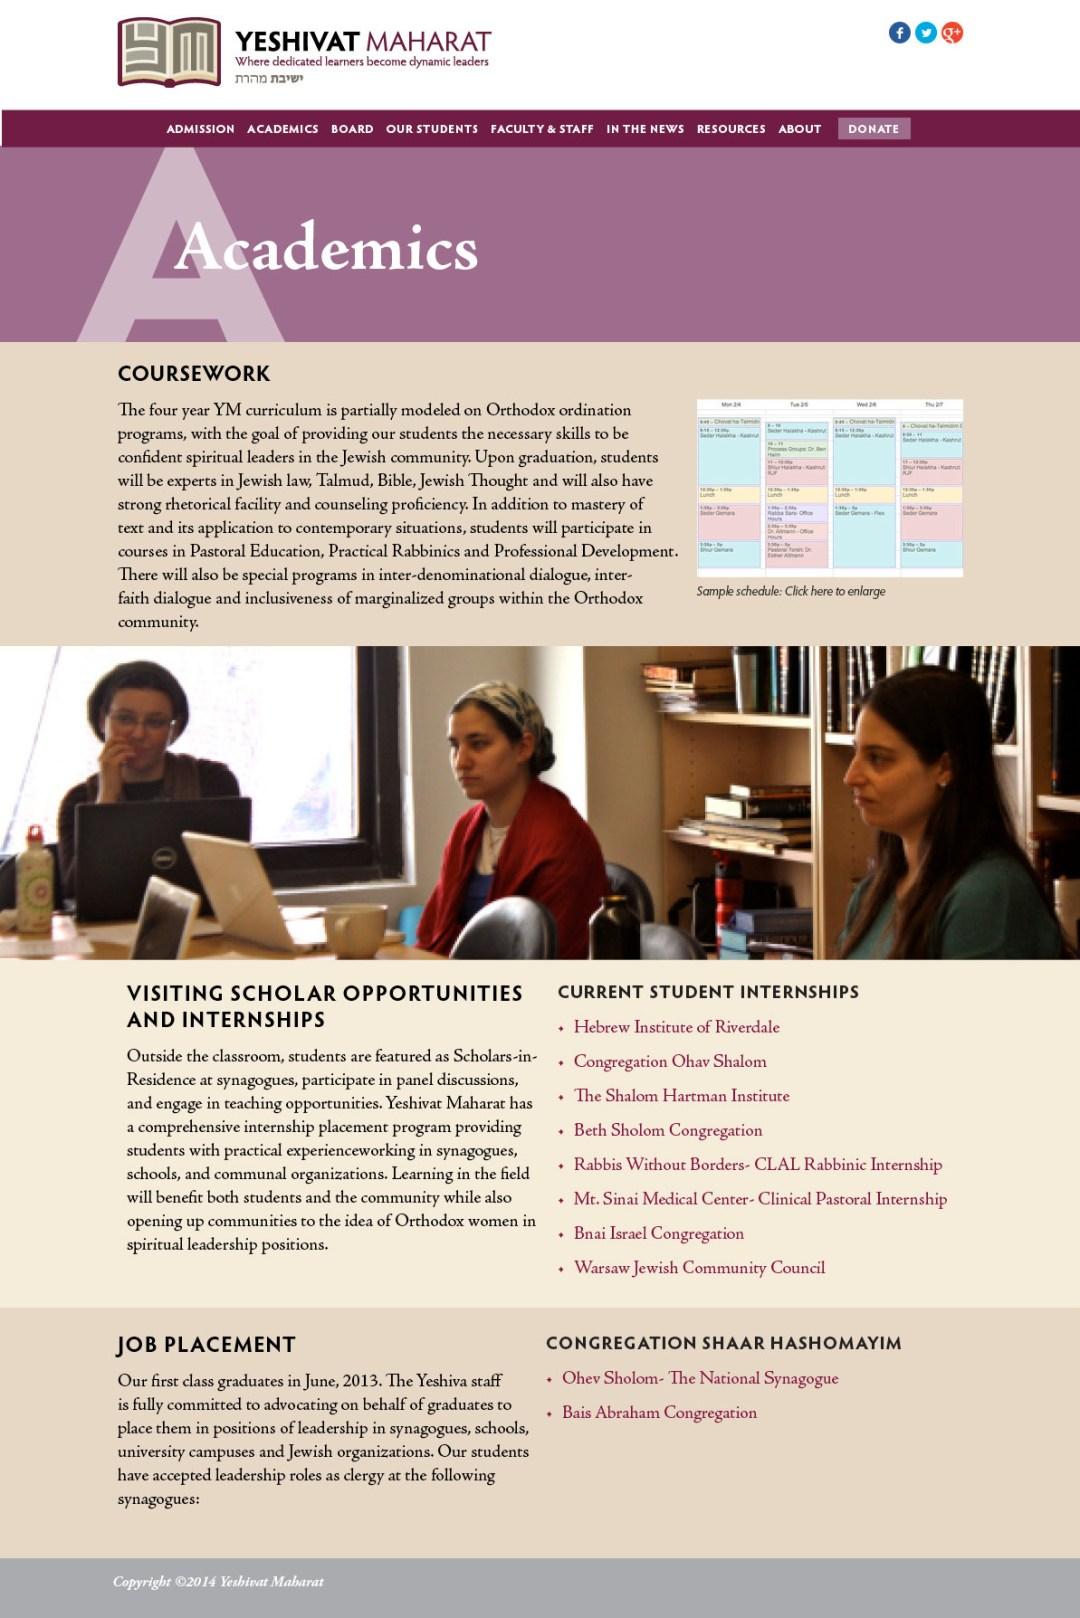 Yeshivat Maharat Scholarship